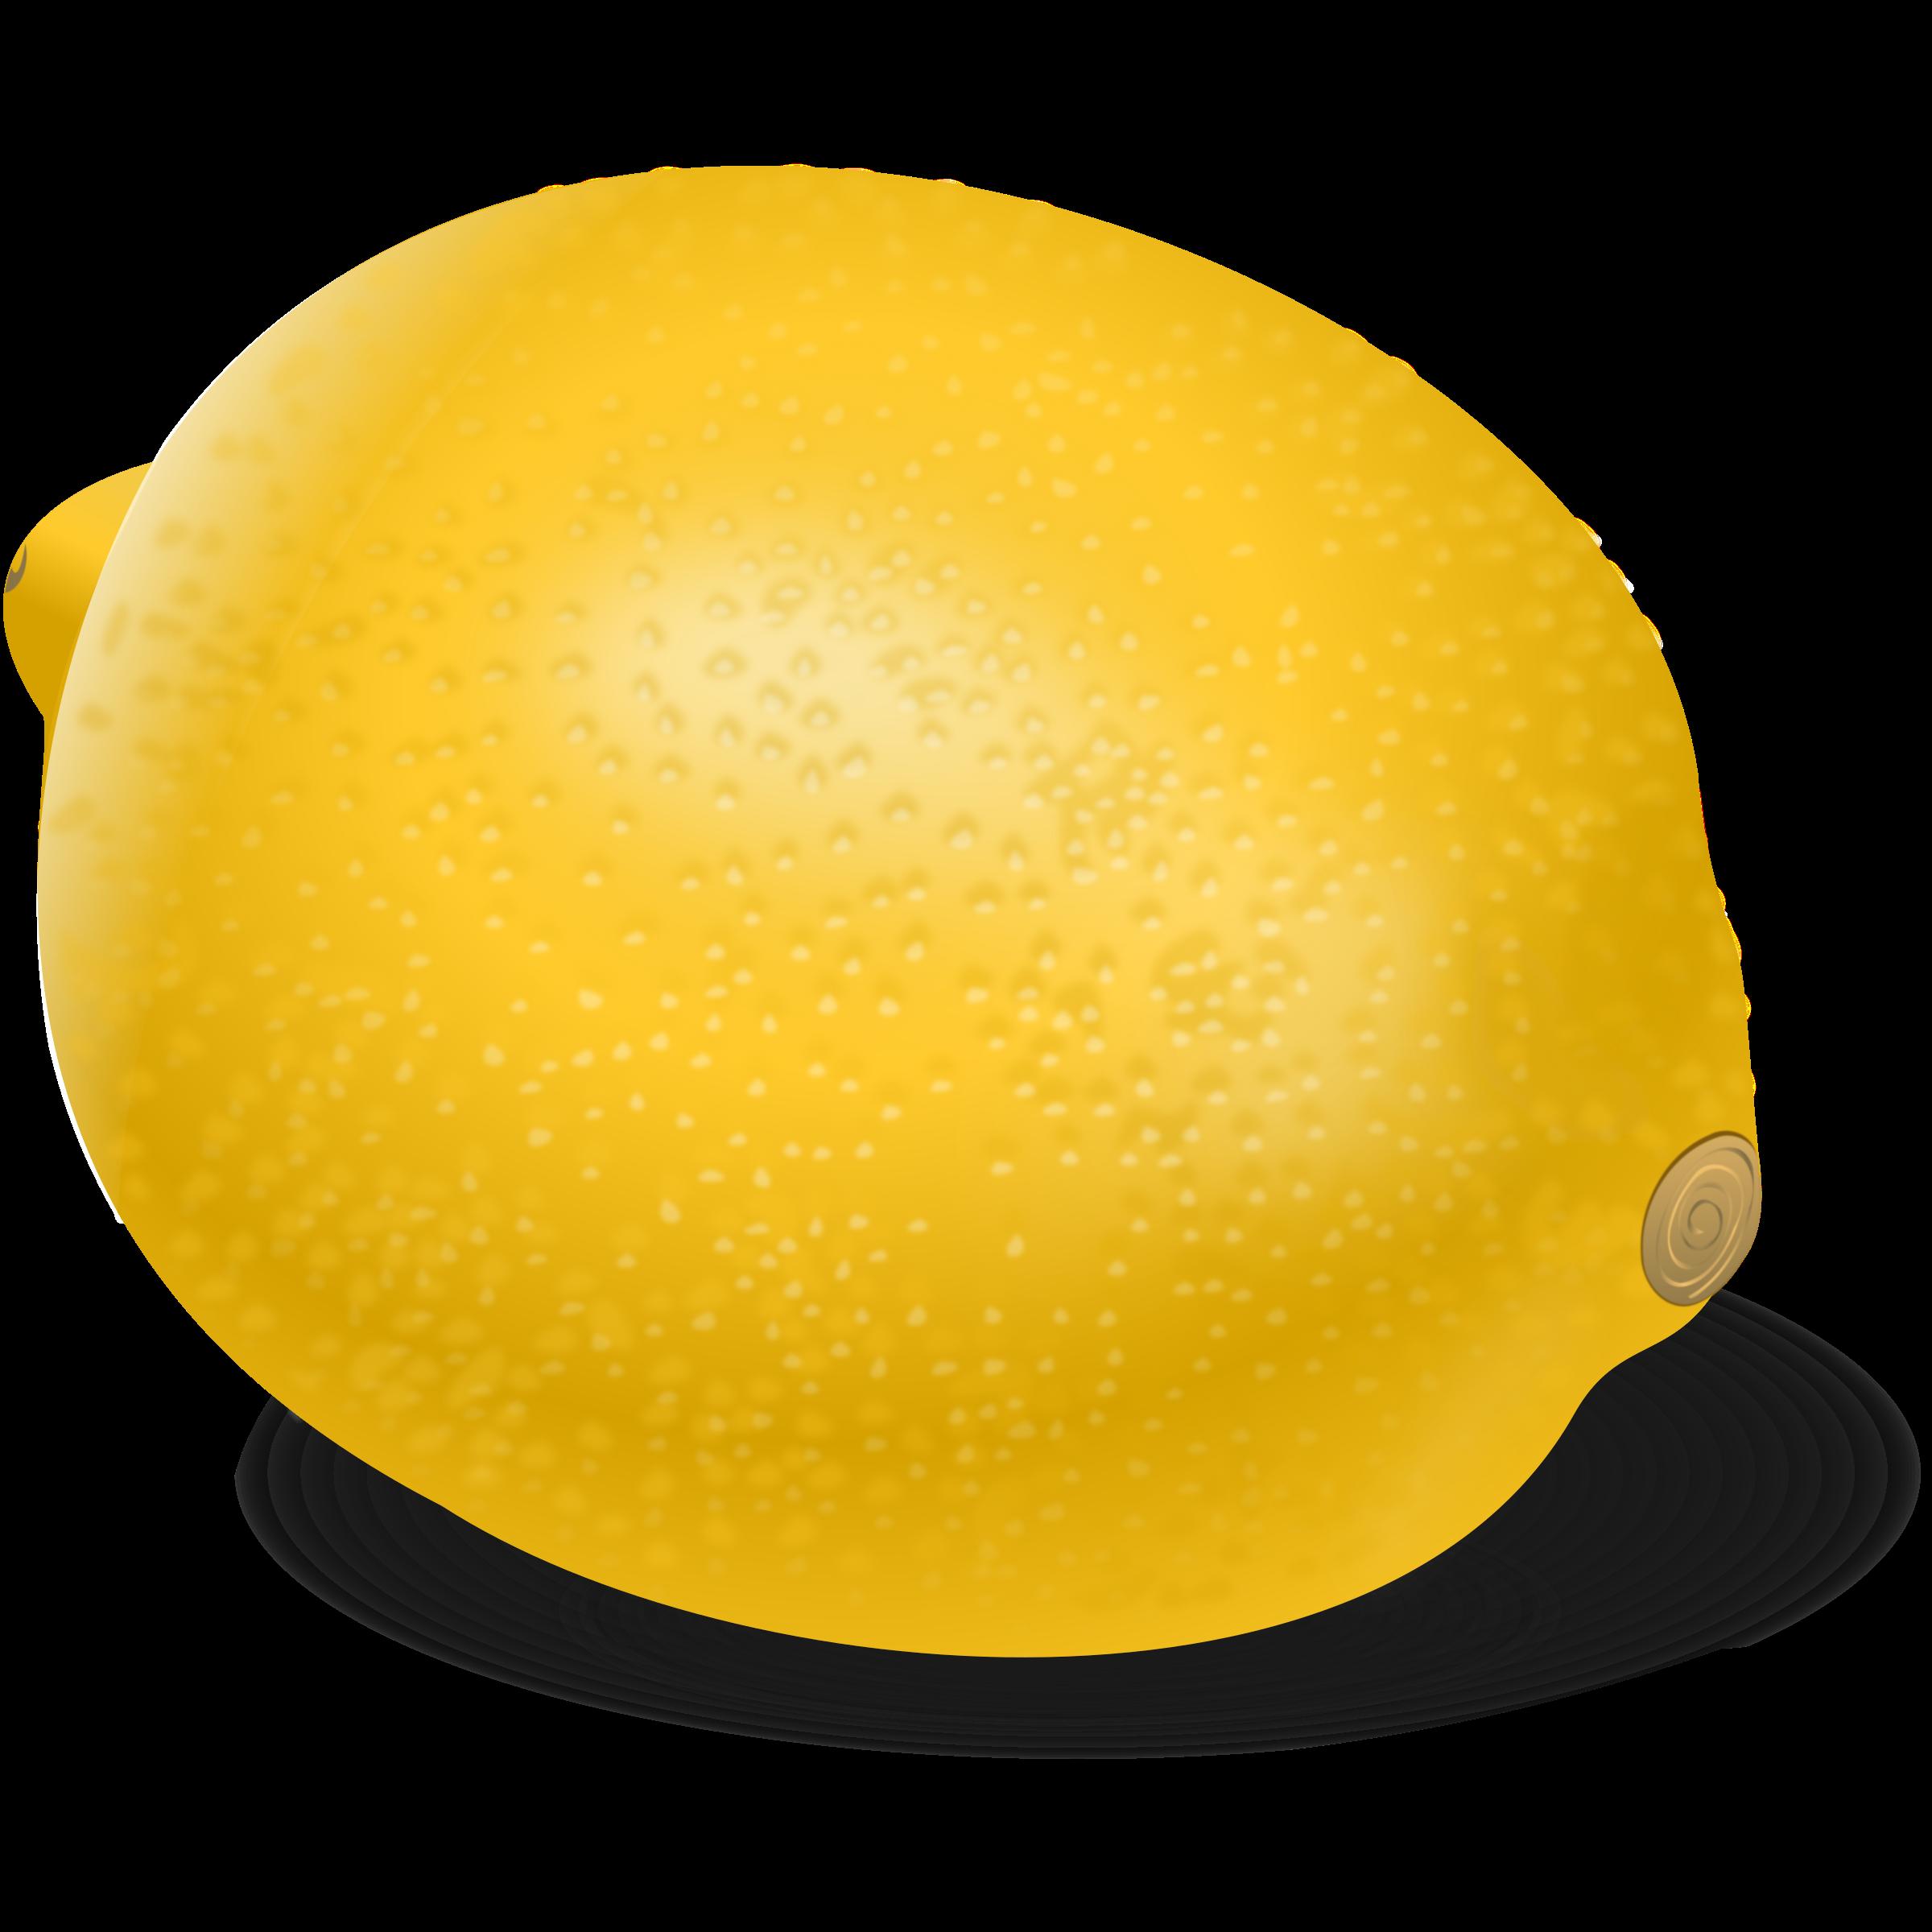 graphic free library Lemons clipart citron. Lemon citrina big image.